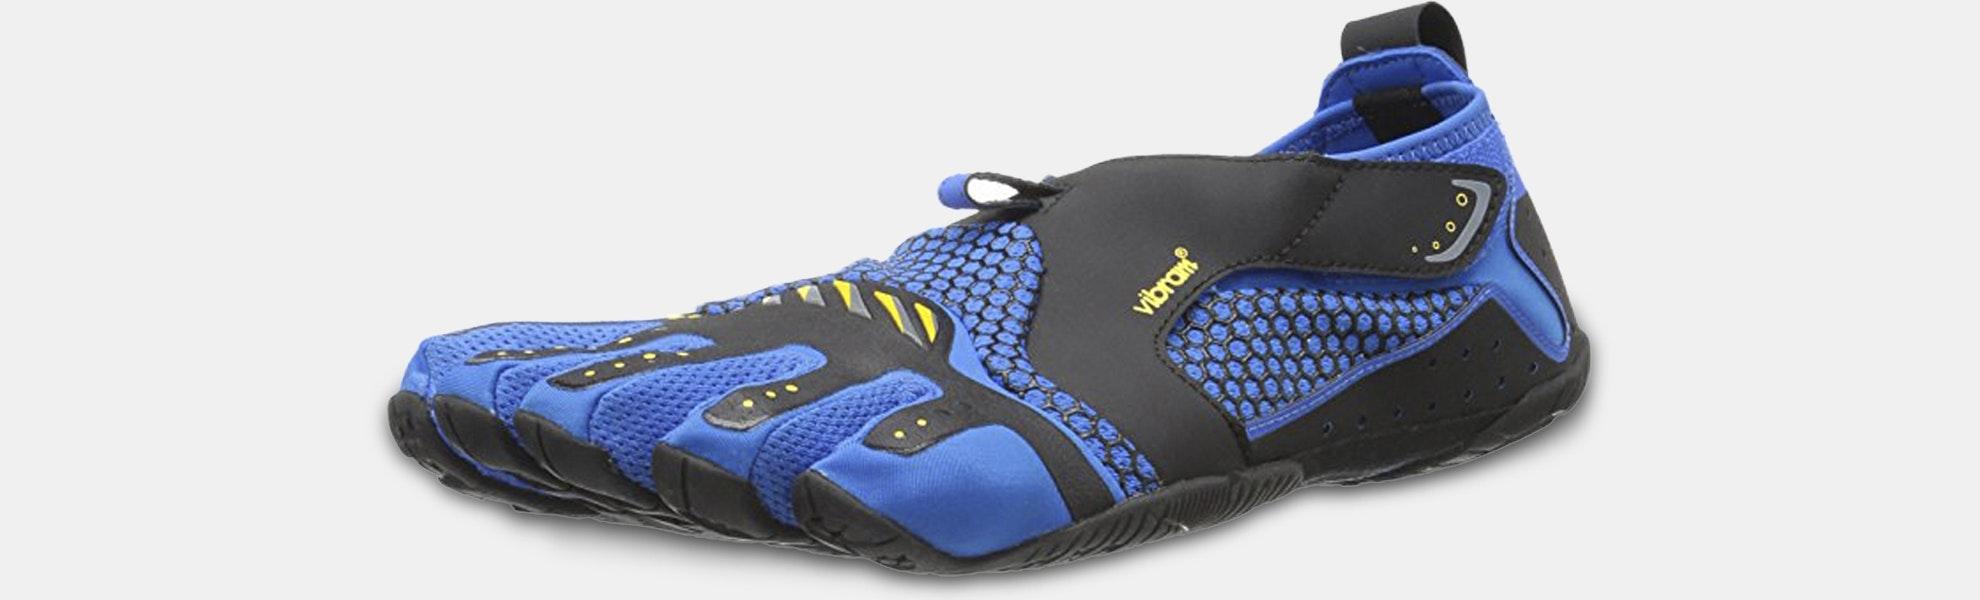 Vibram Five Fingers Signa Water Shoes